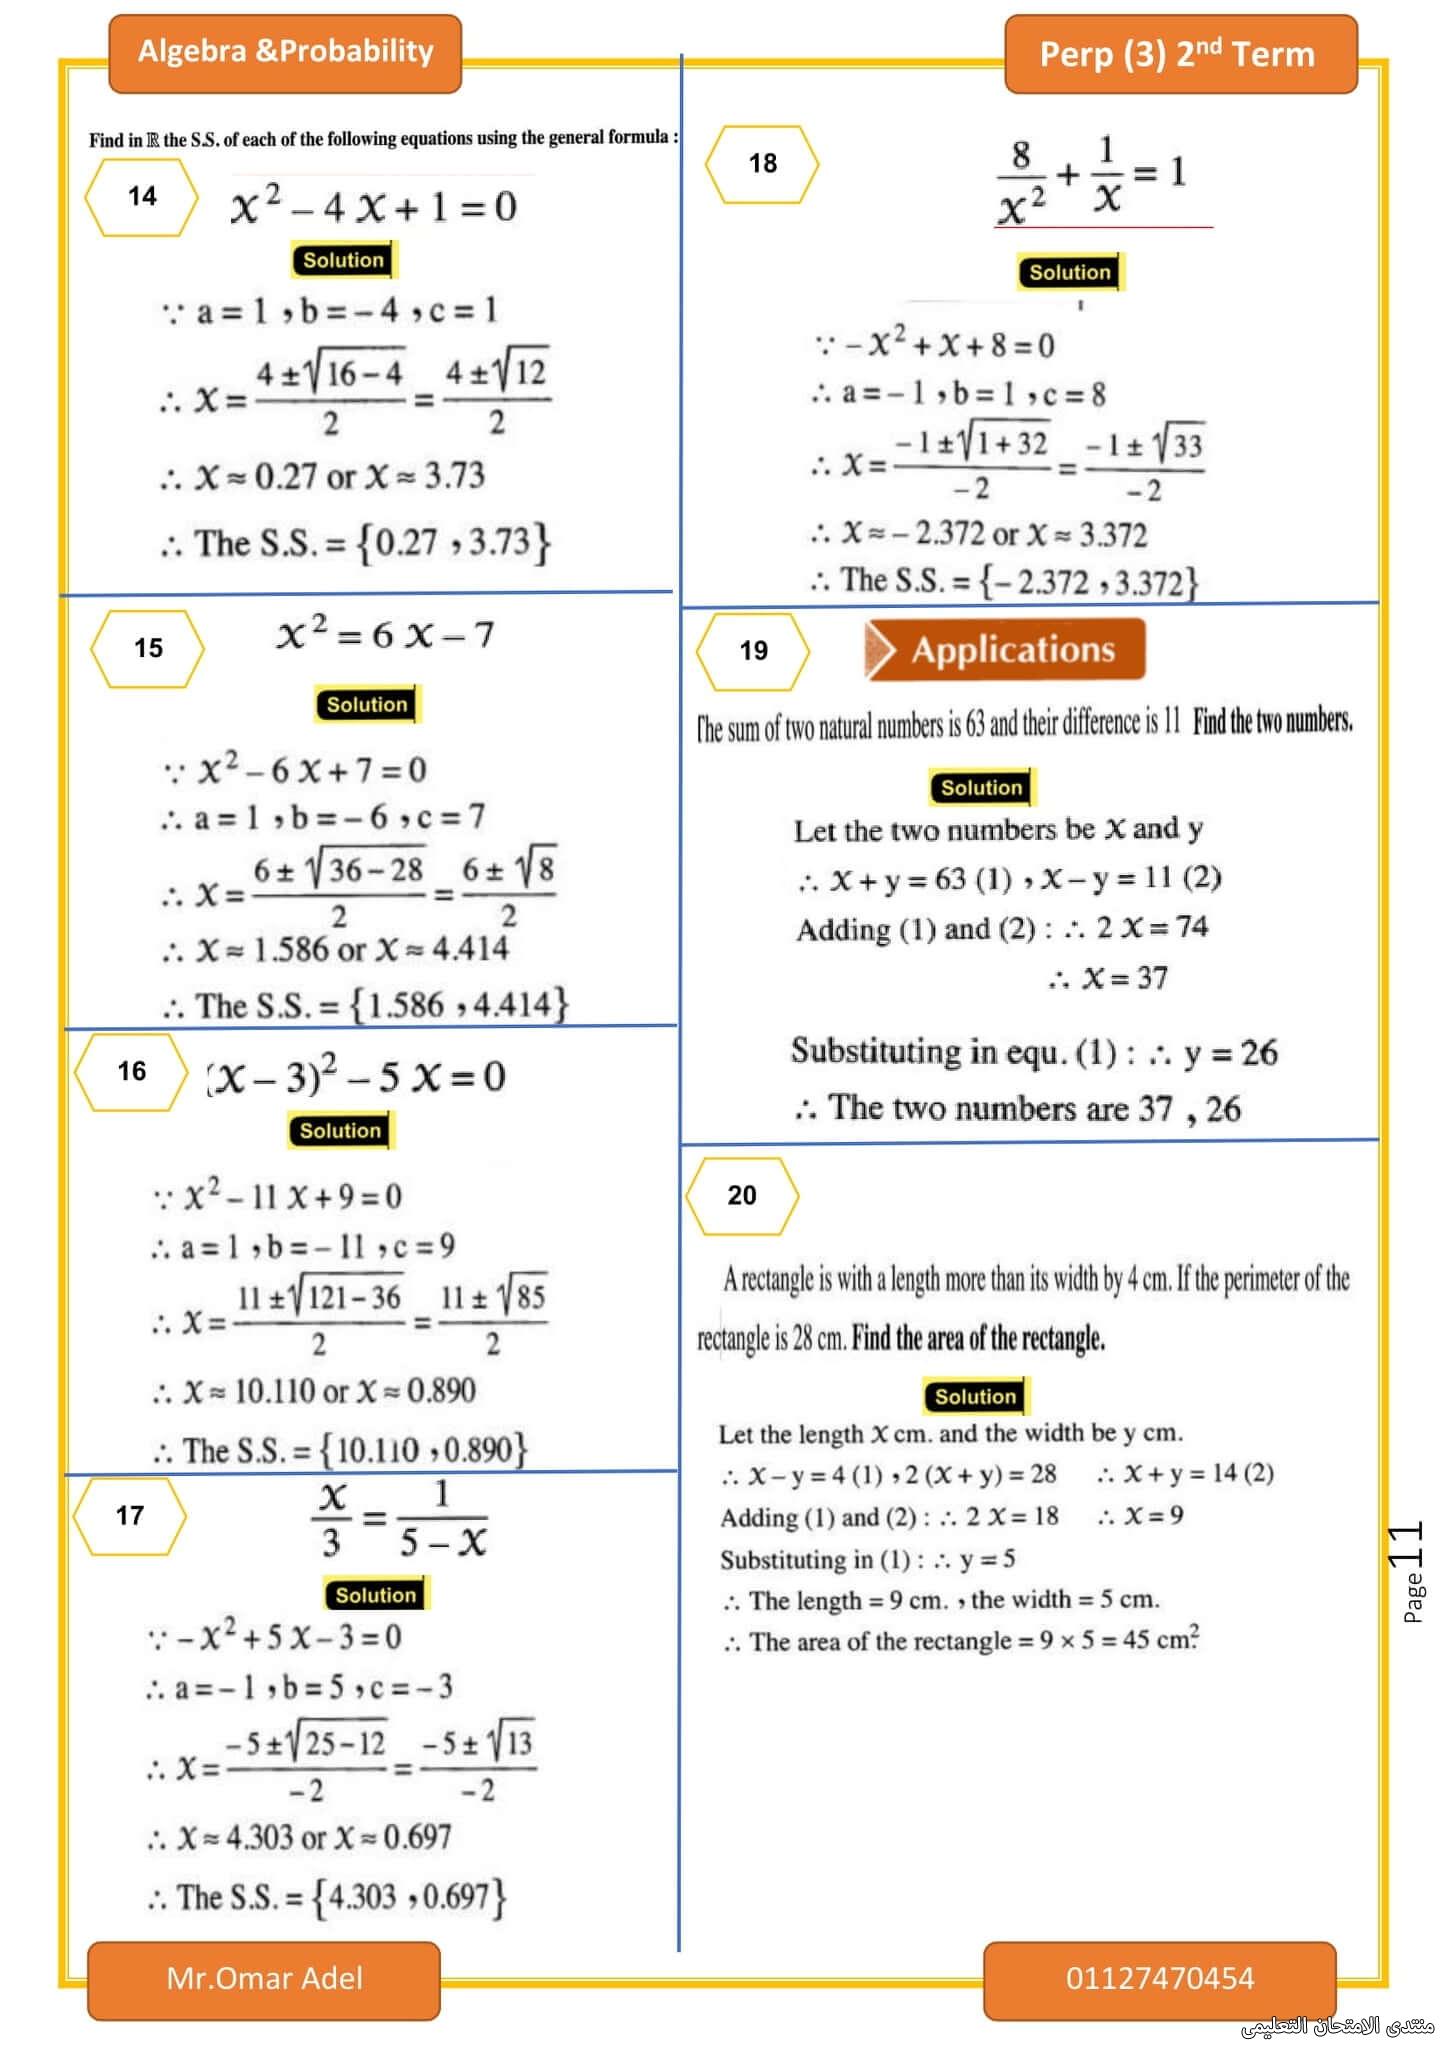 exam-eg.com_1621150392865911.jpg